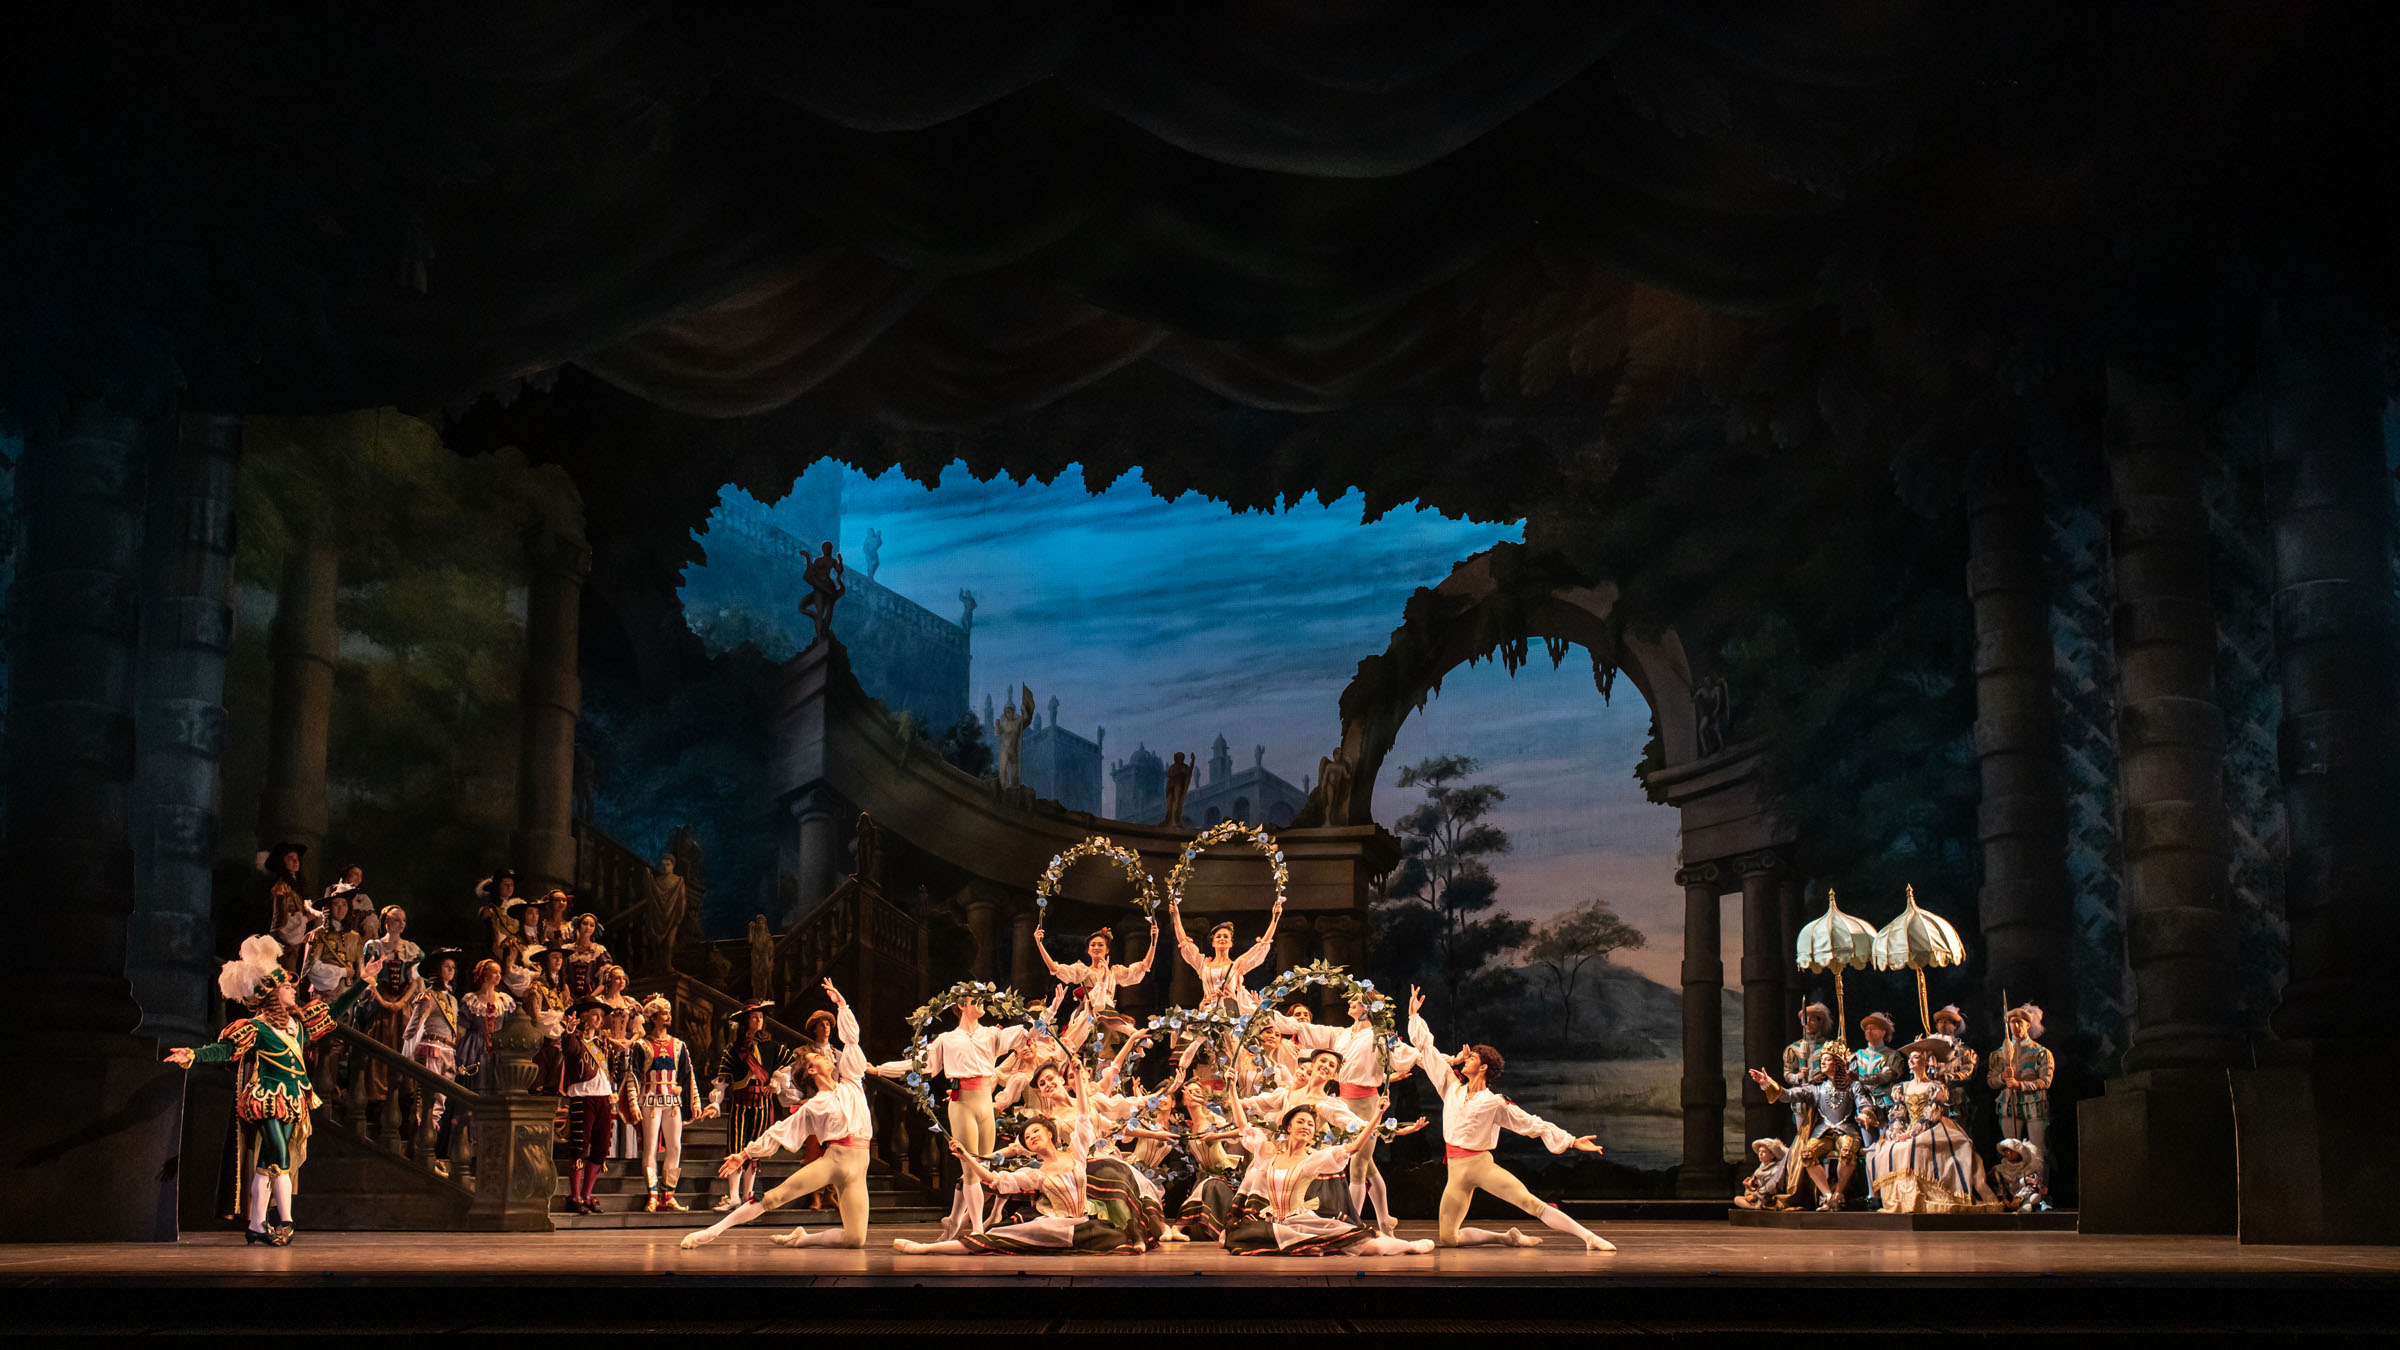 Production photo of Marius Petipa's The Sleeping Beauty